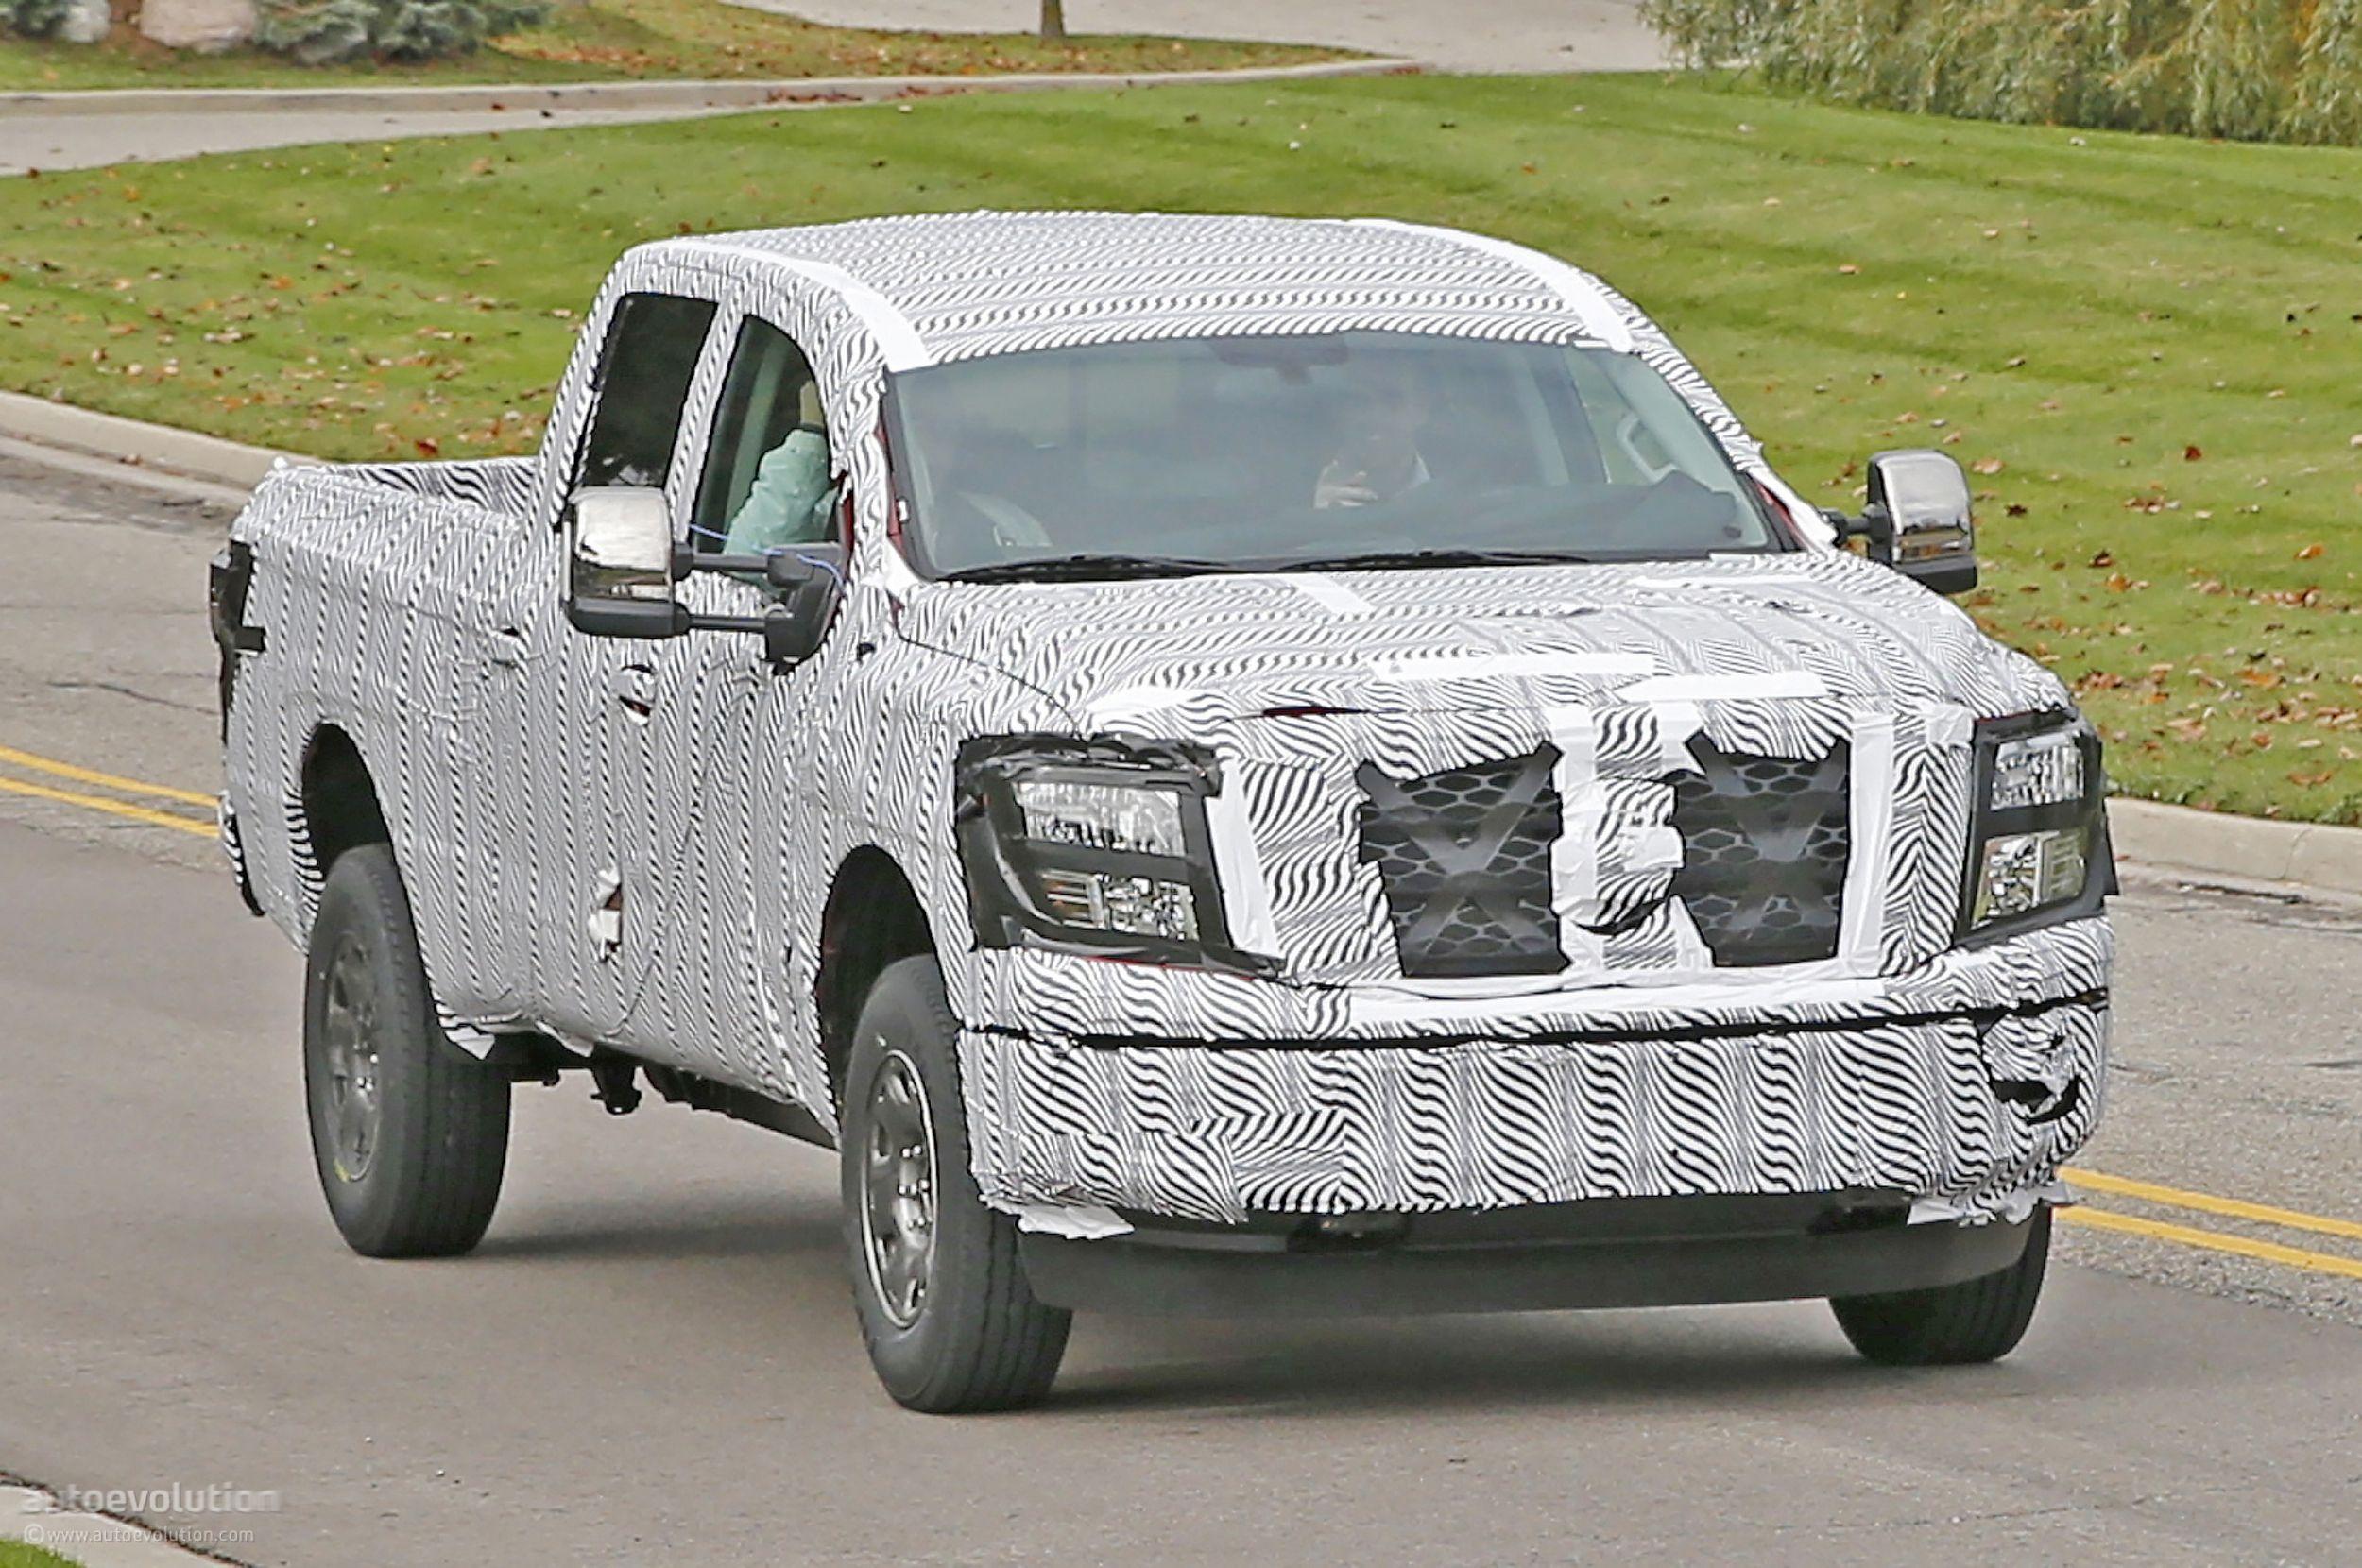 2016 Nissan Titan Spied Testing Isv Cummins Turbo Diesel Autoevolution